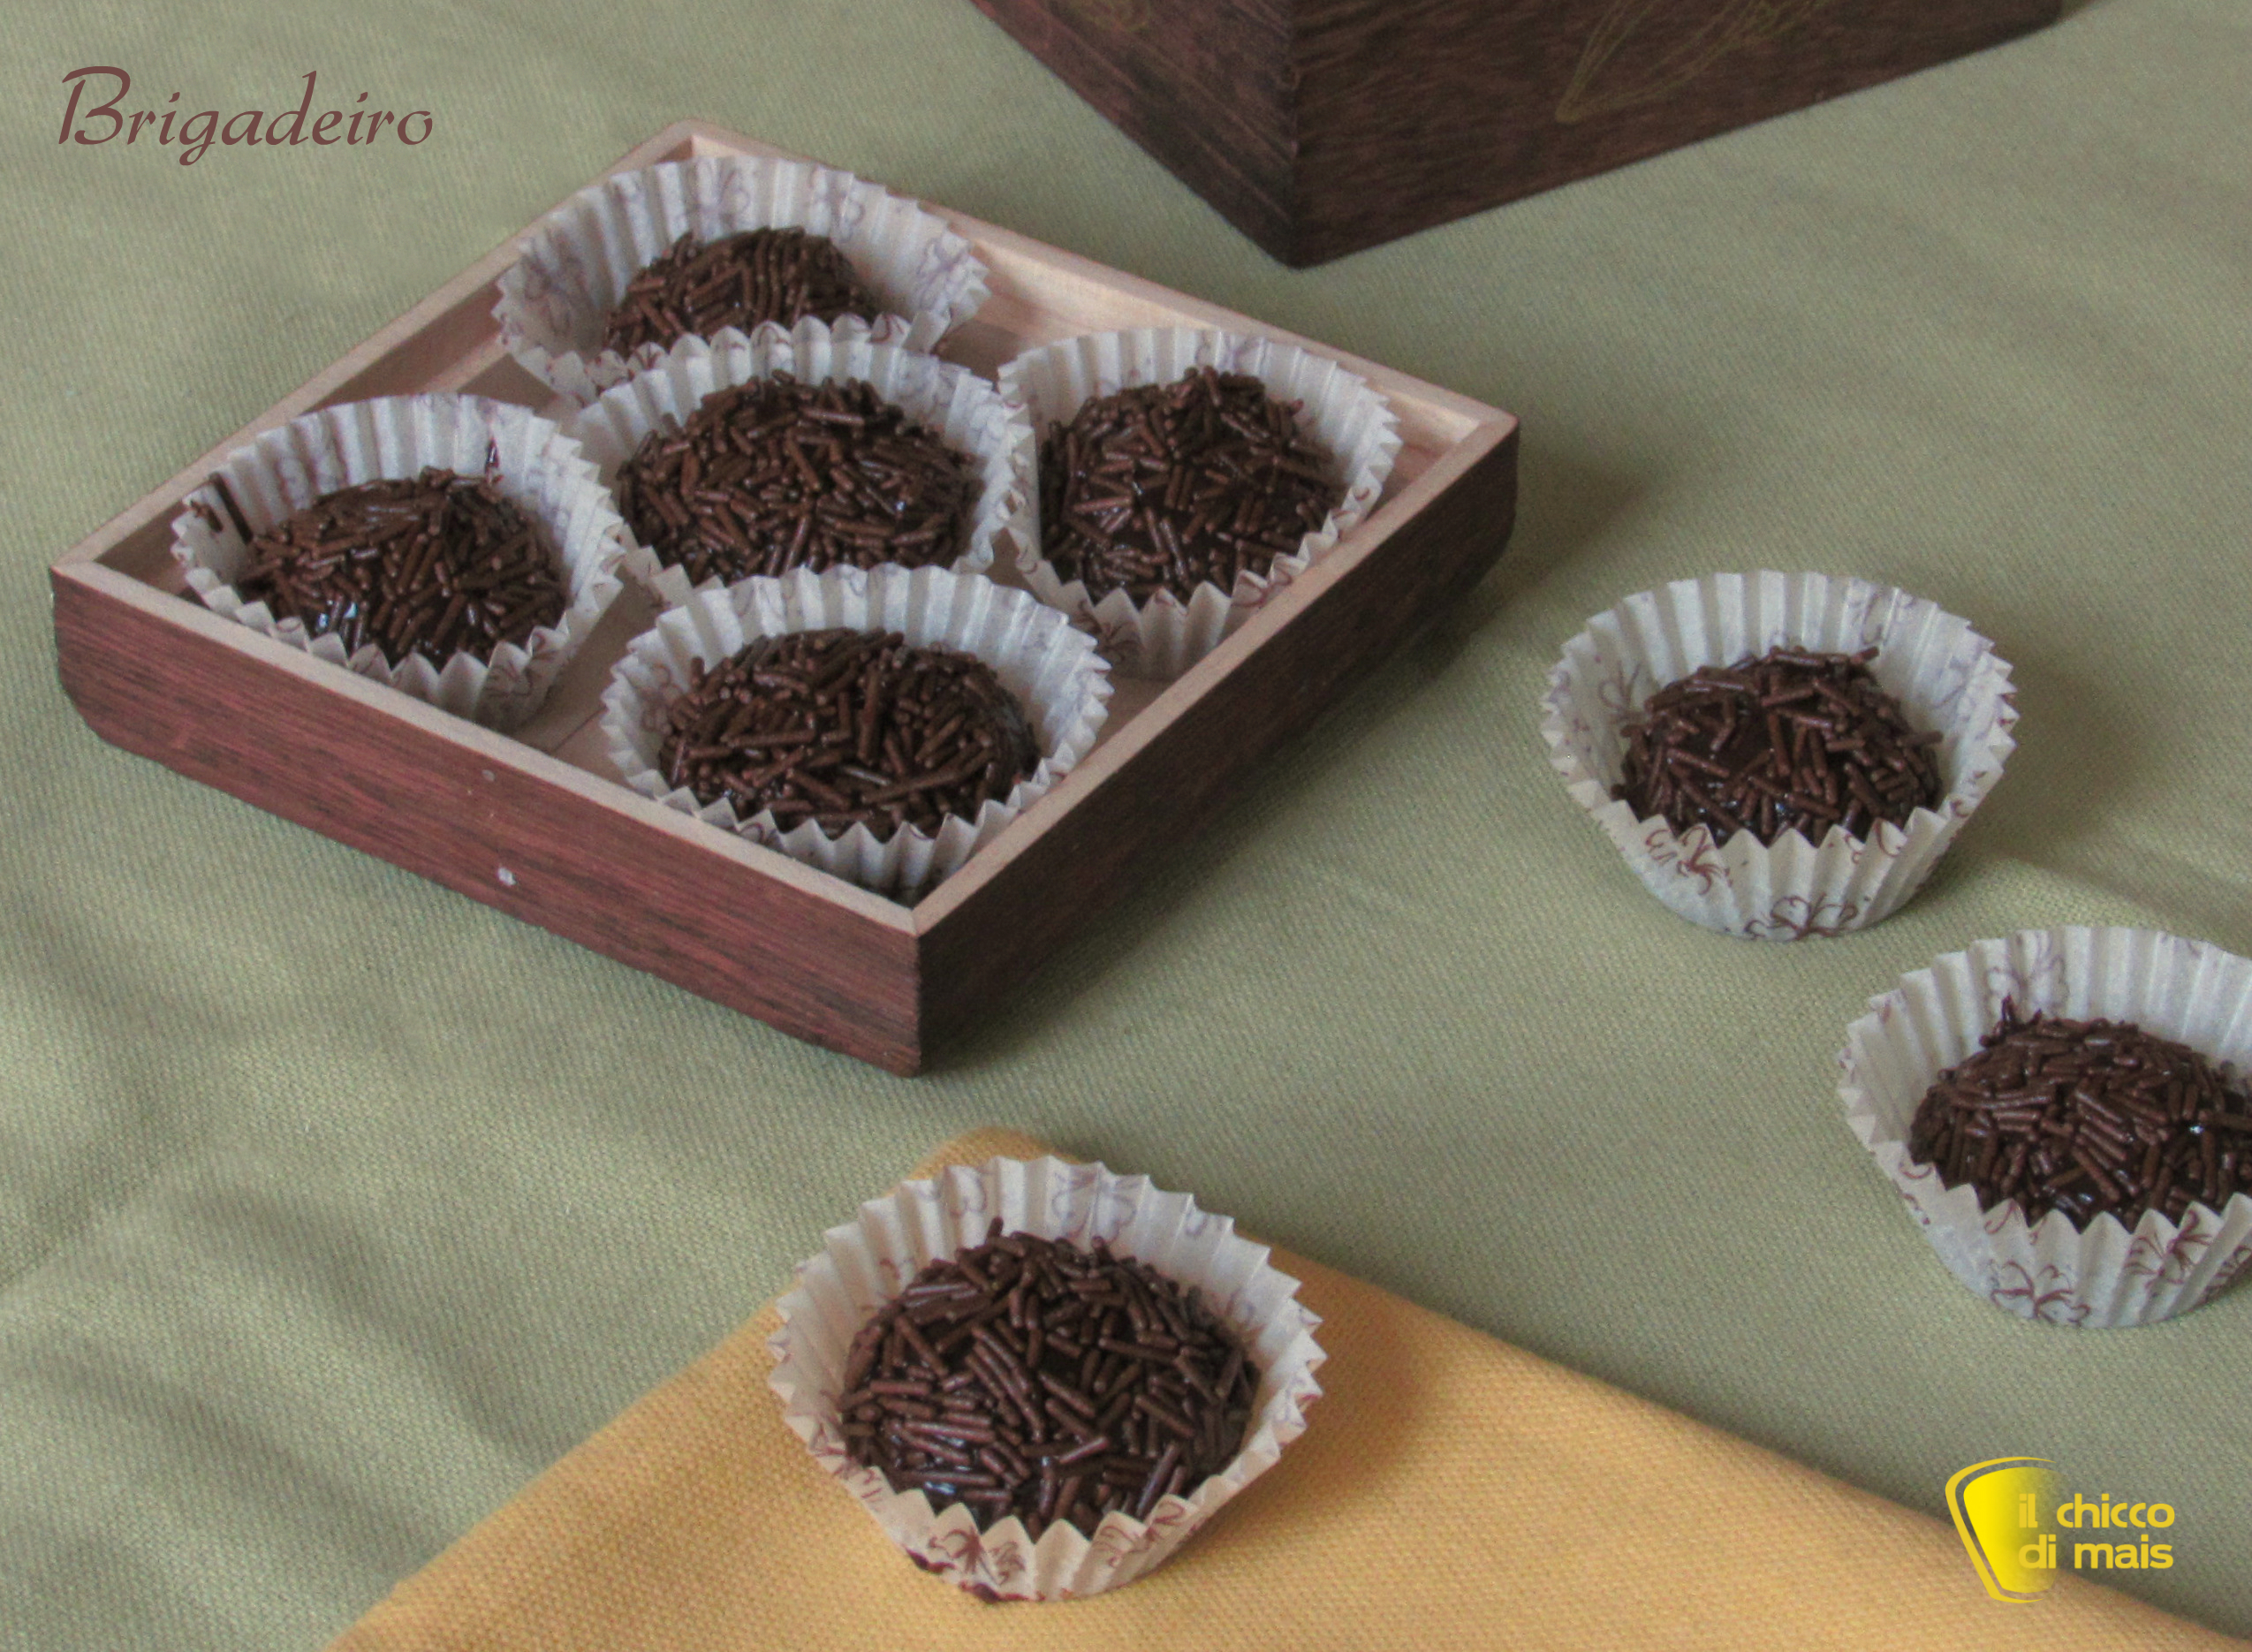 Brigadeiro - palline al cioccolato, ricetta brasiliana